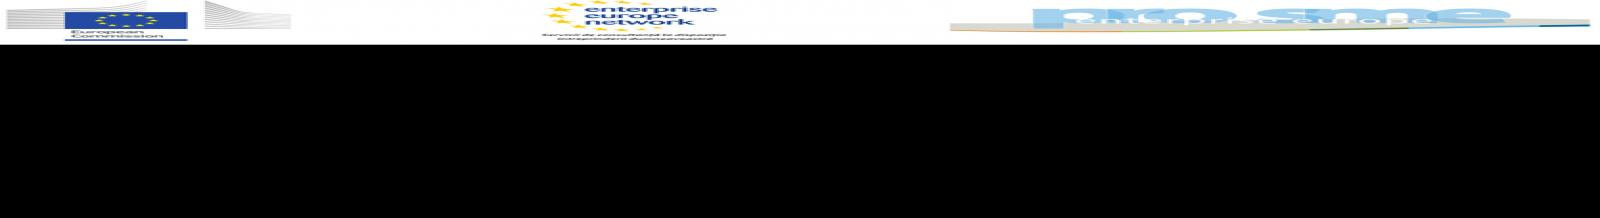 prosme-835x114px_0.jpg